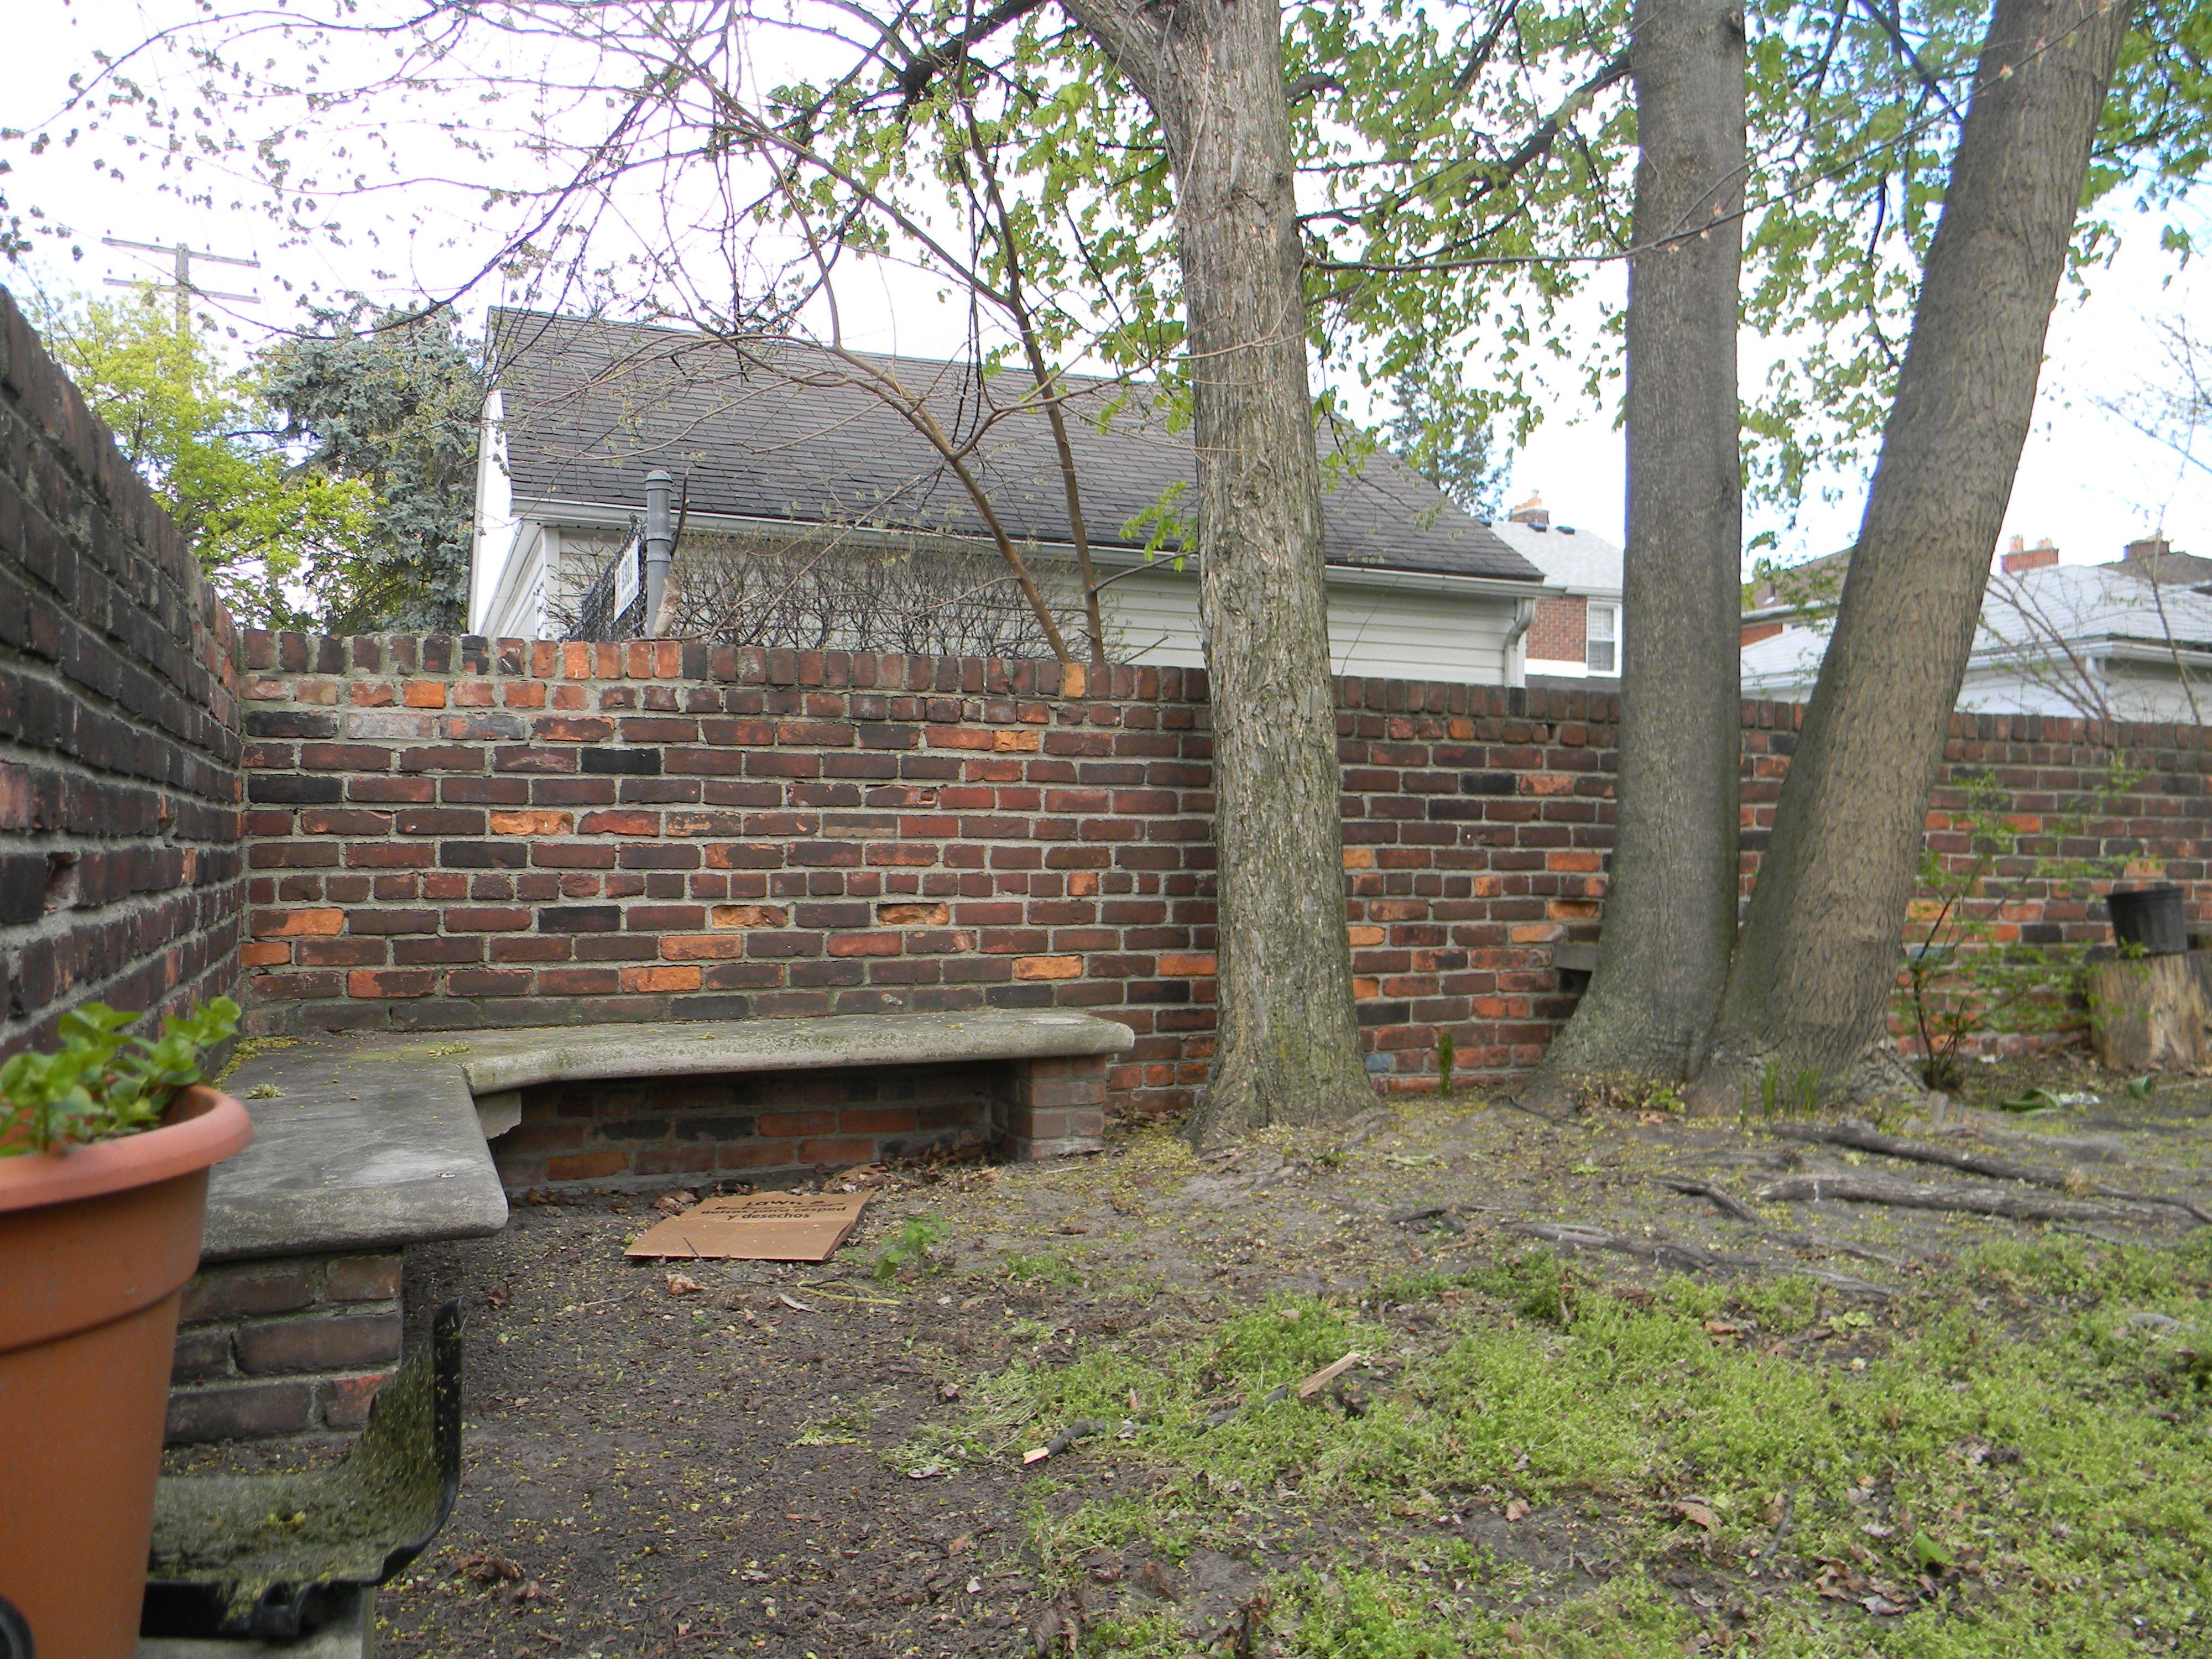 benches and shelves for pots were built into the backyard garden